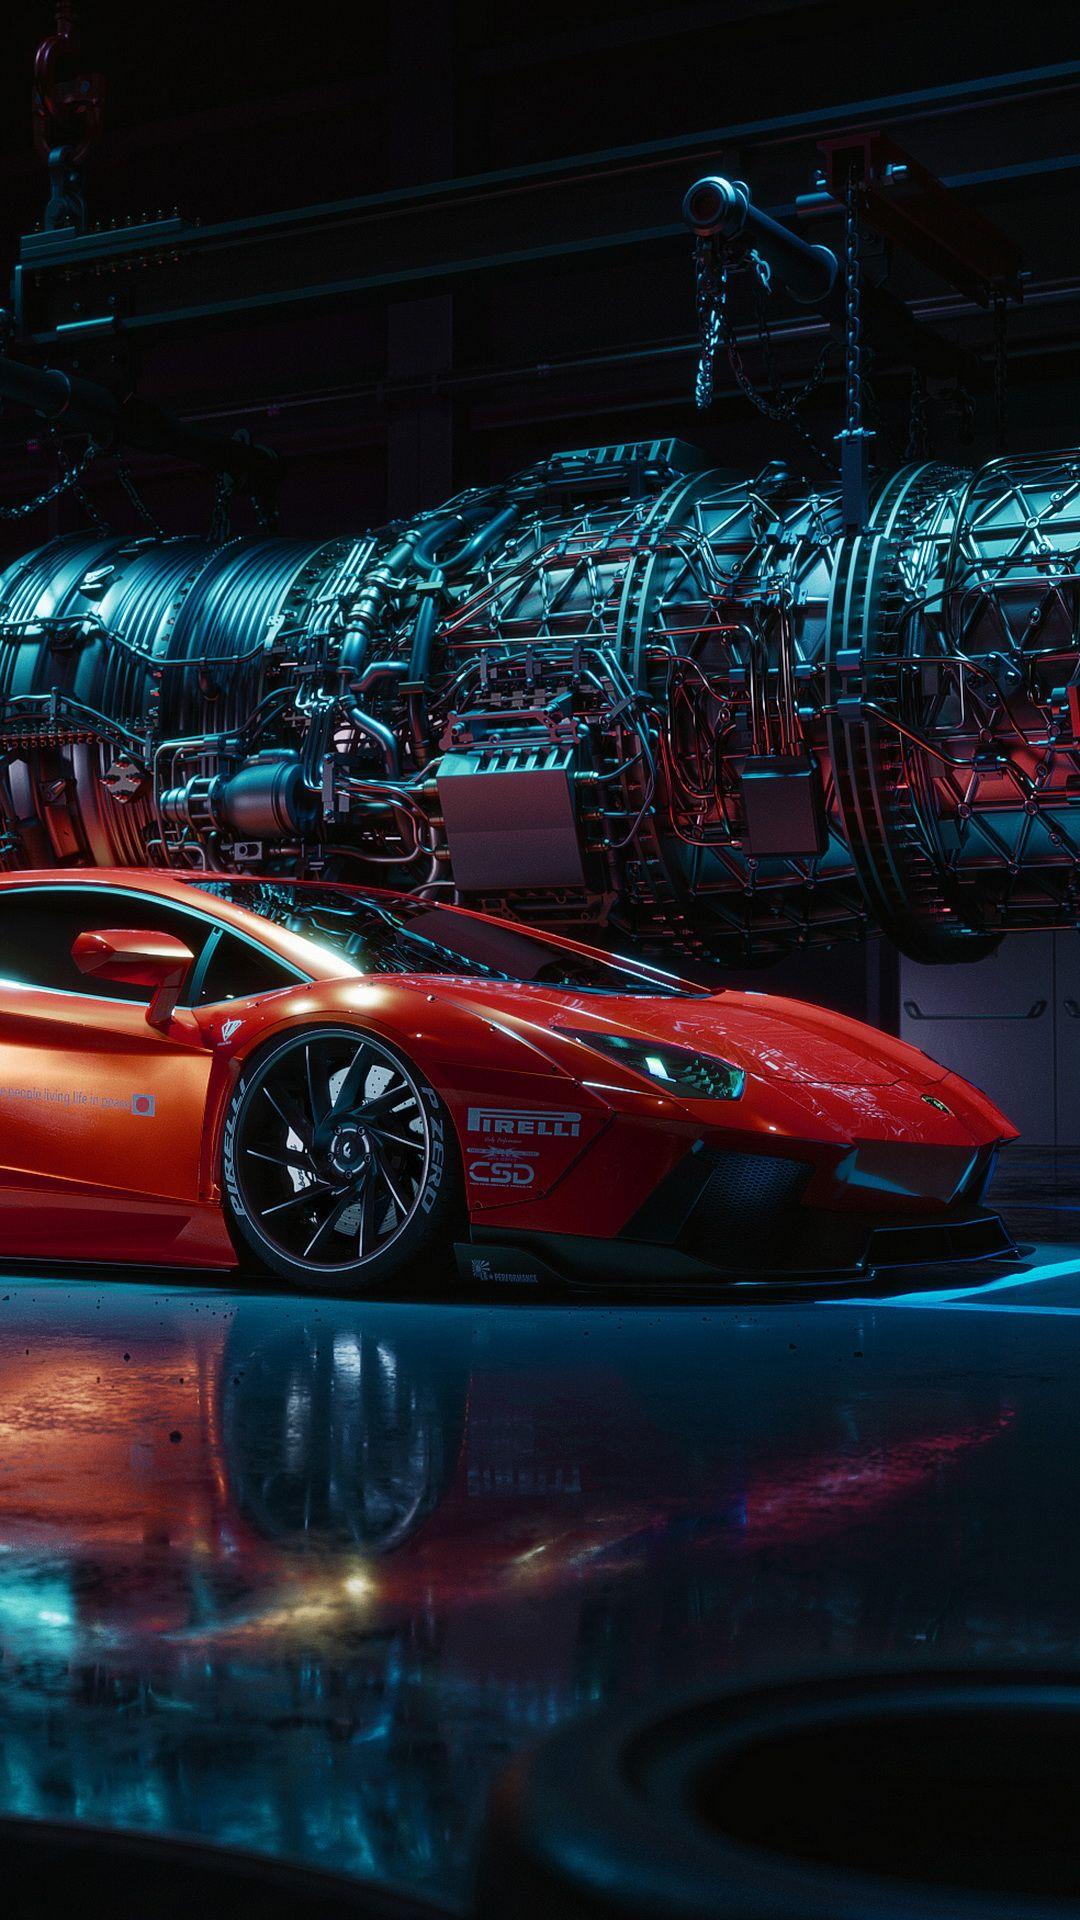 Pin By Aroundcars On Cars Wallpapers Red Sports Car Lamborghini Cars Lamborghini Aventador